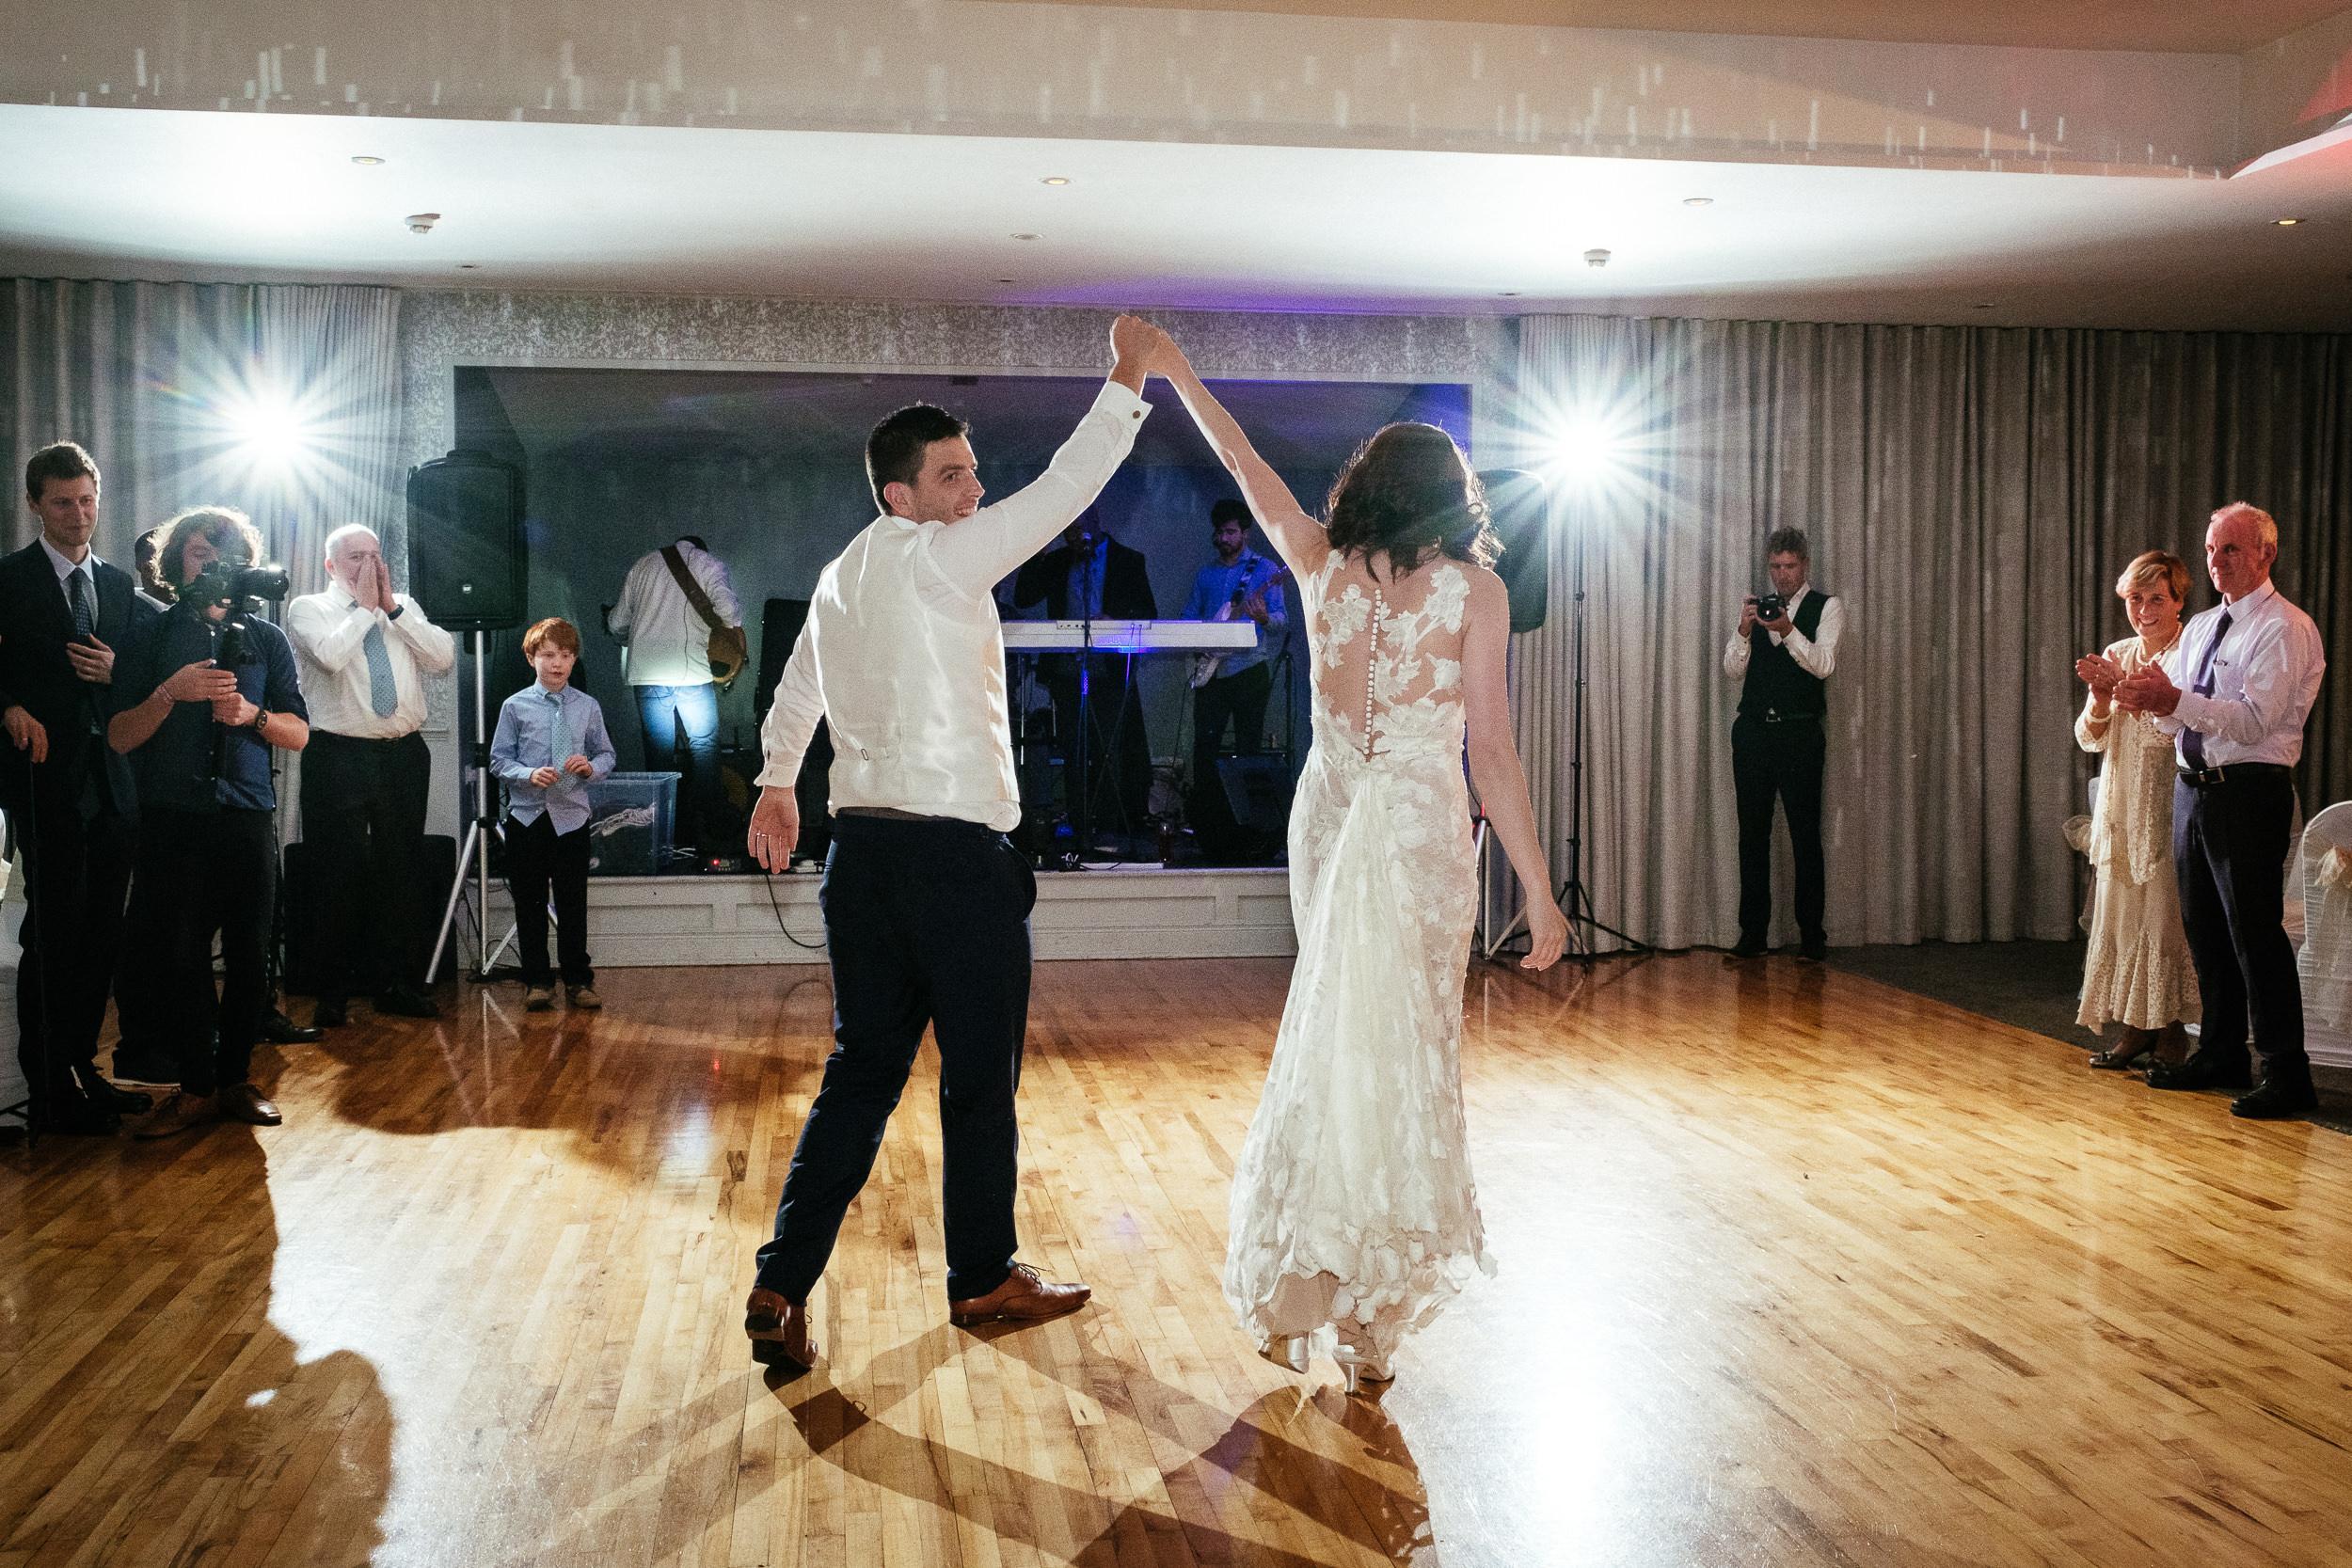 Dunmore House Hotel Clonakilty Cork Wedding Photographer 128